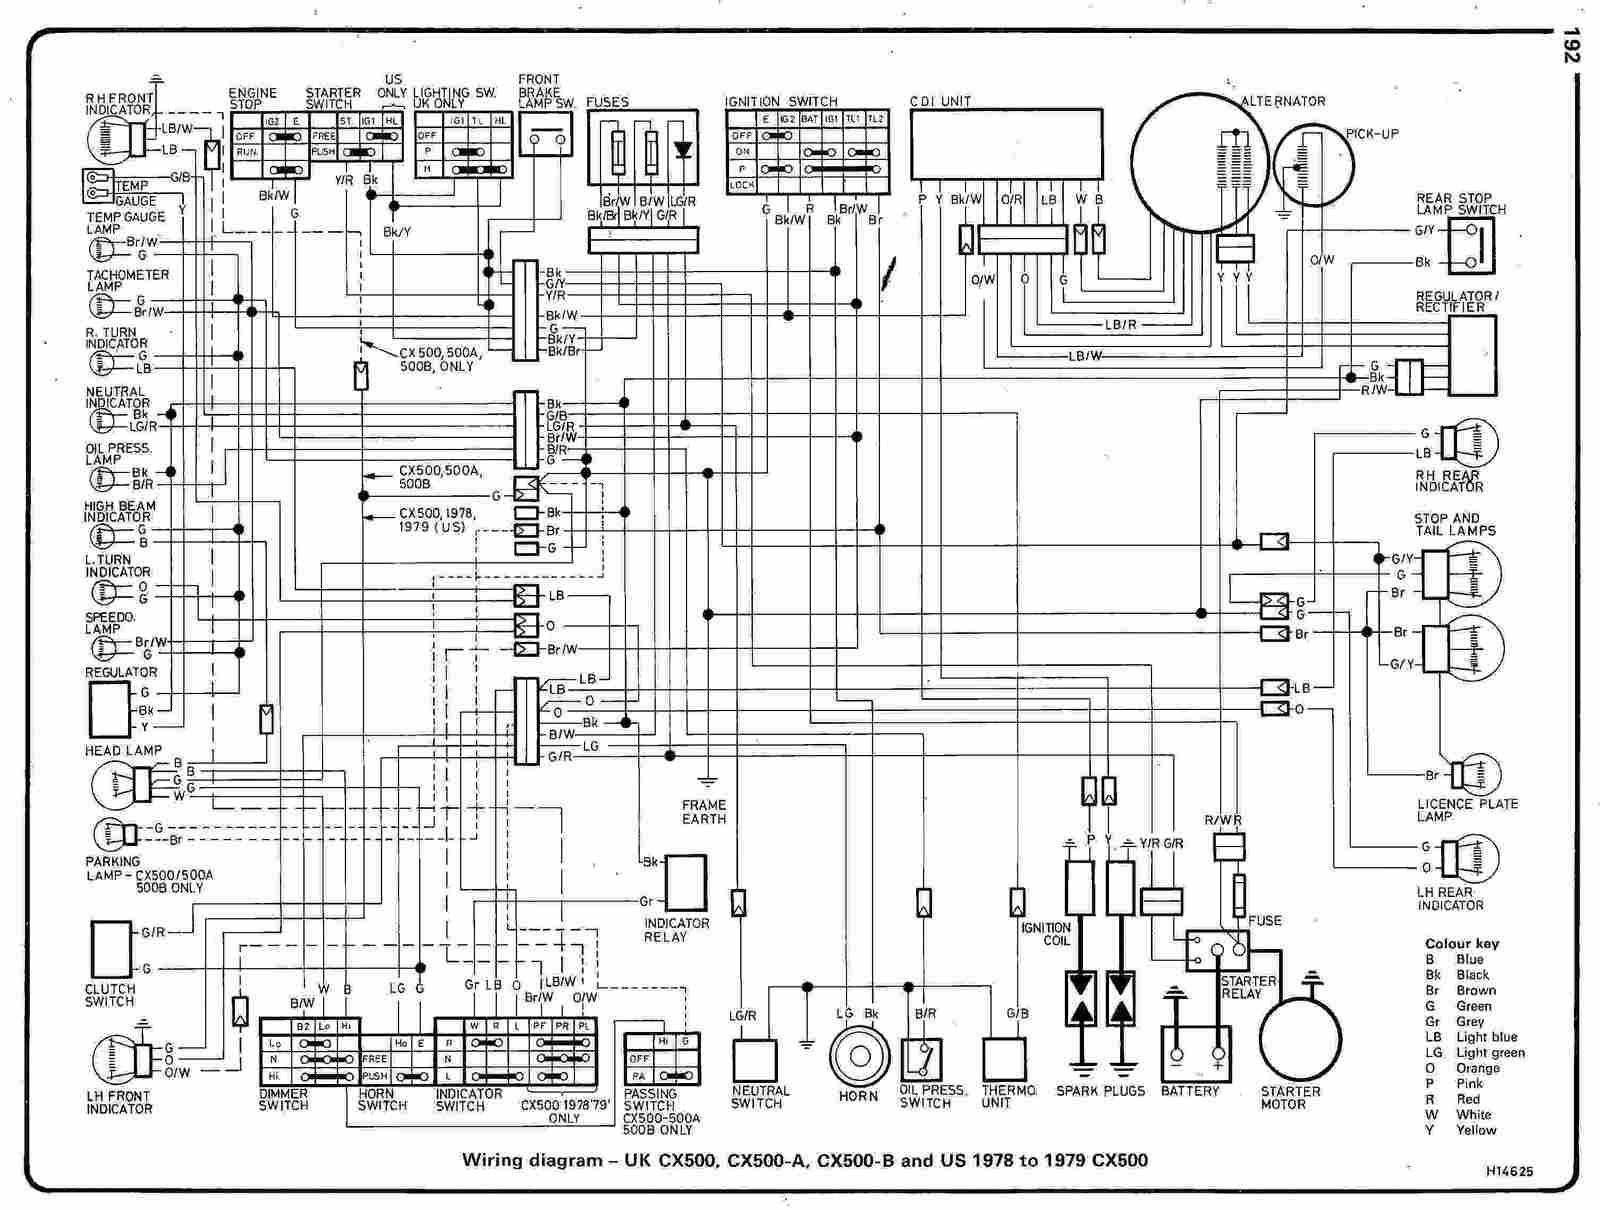 1982 cj5 wiring diagram